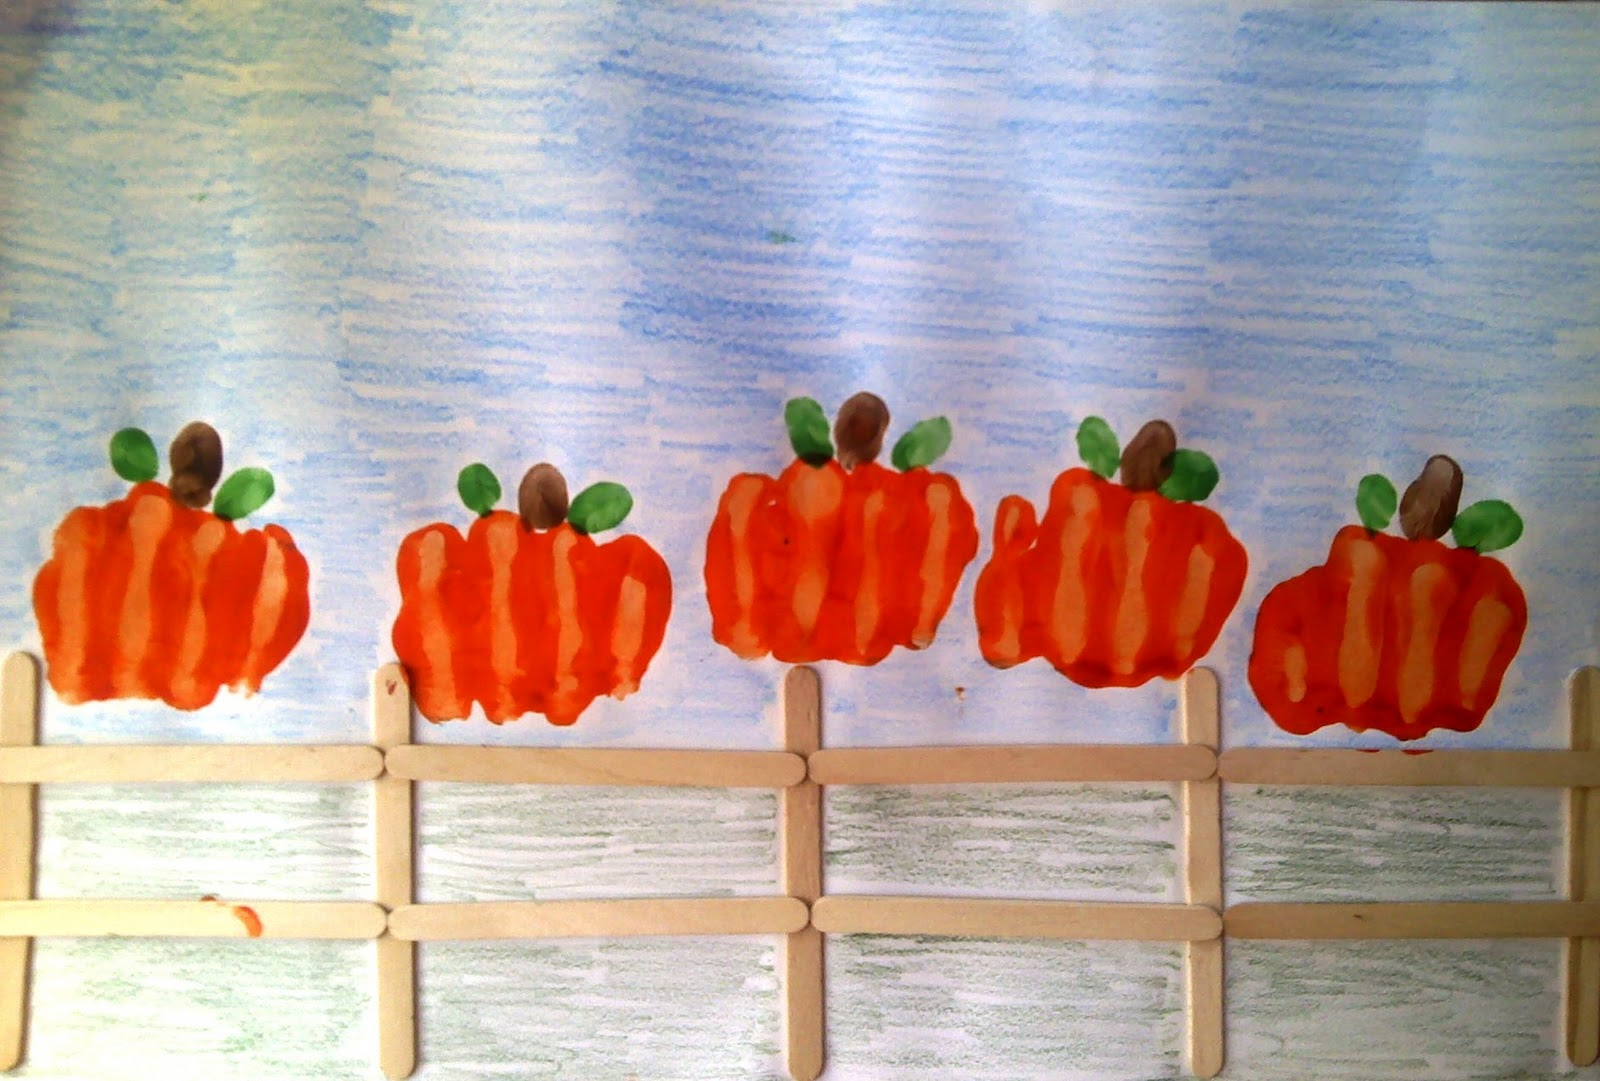 This is a photo of Gargantuan Pumpkin Projects for Kindergarten